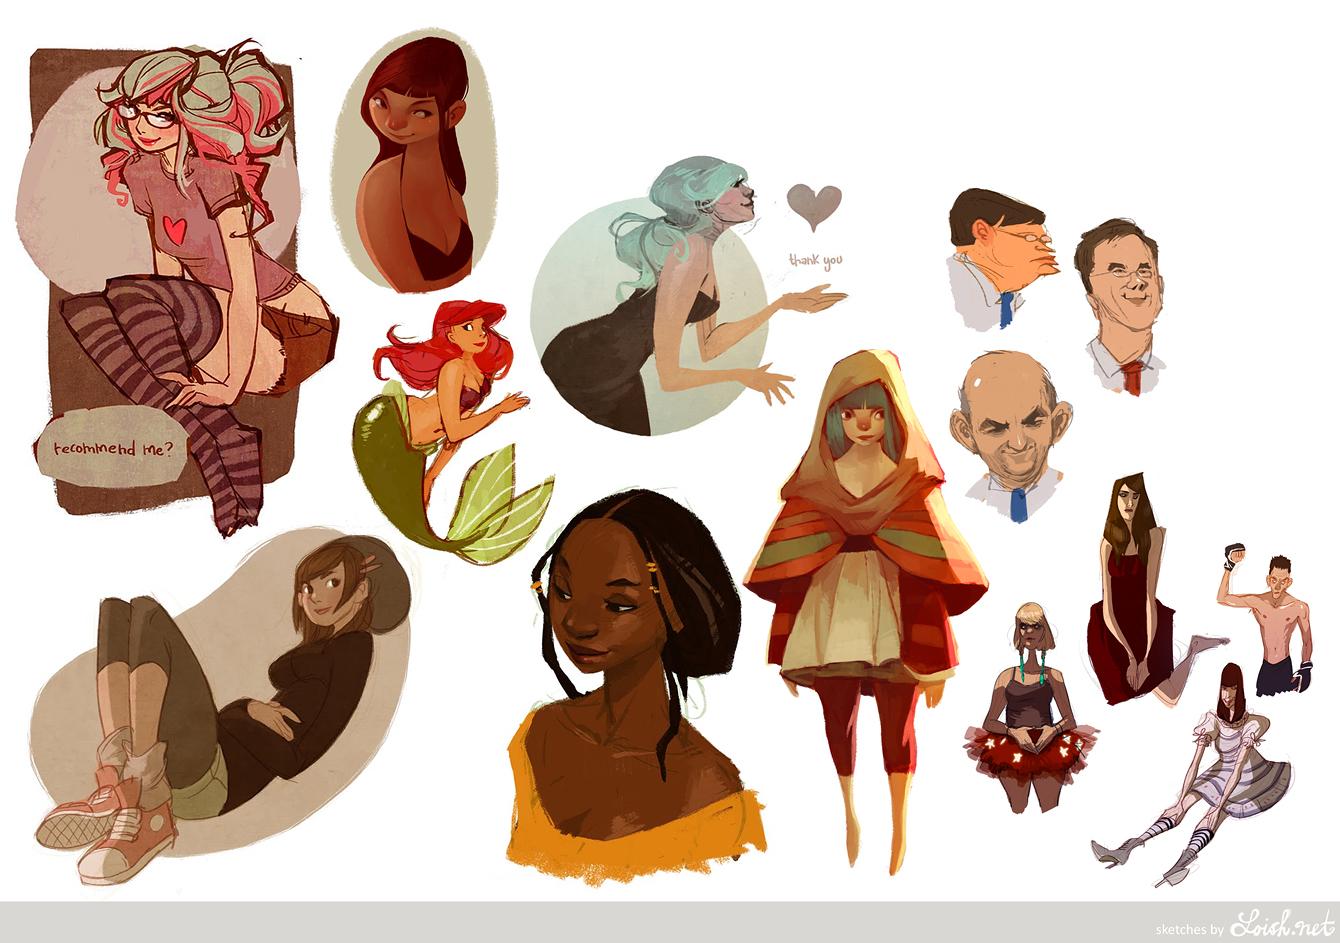 sketchblog sketchdump 3 by loish